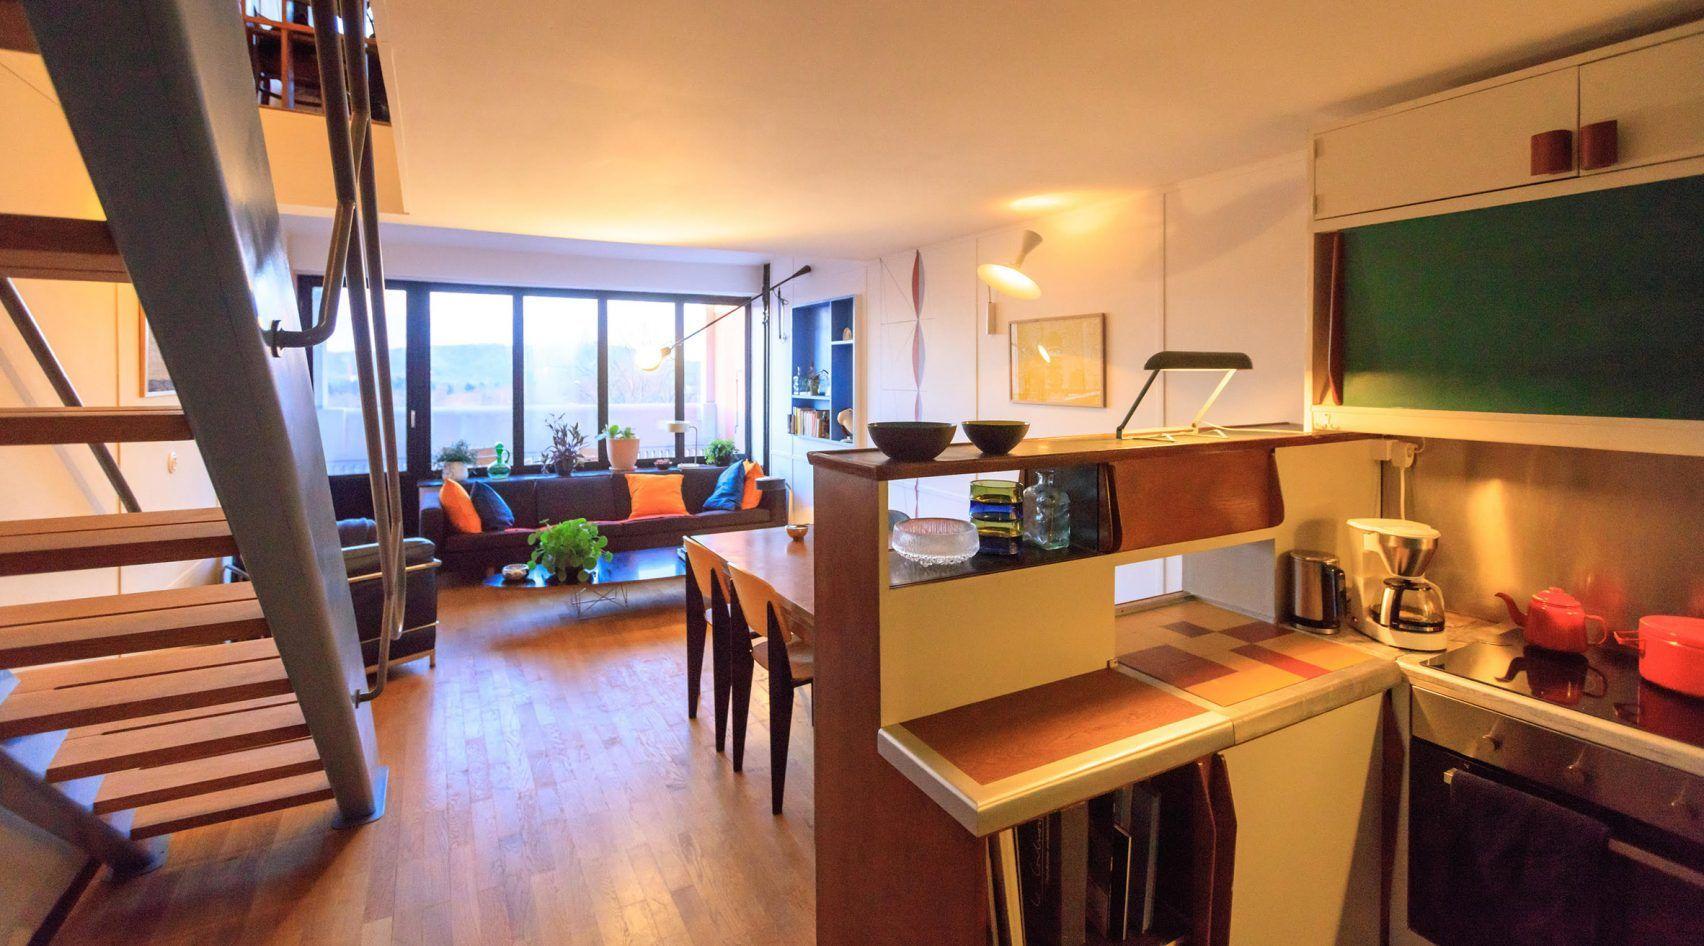 Le Corbusier S Interior Realised By Philipp Mohr At Unite D Habitation In Berlin Nyc Rooms Interior Architecture Design Le Corbusier